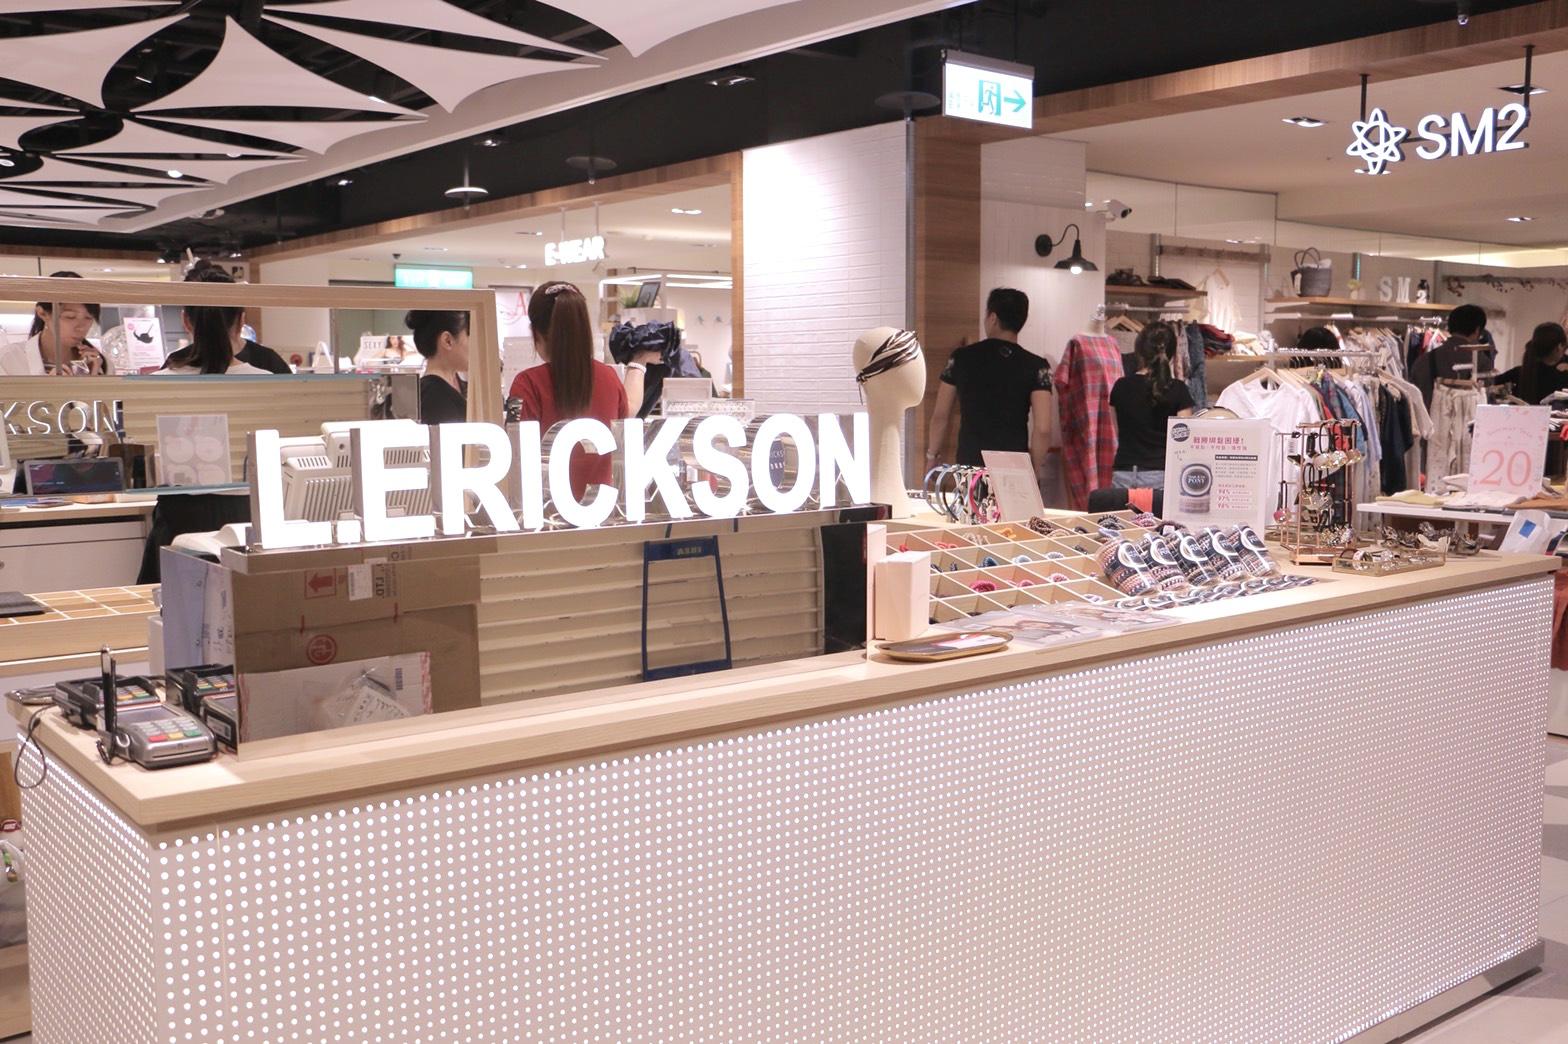 L. ERICKSON 新光三越南西店